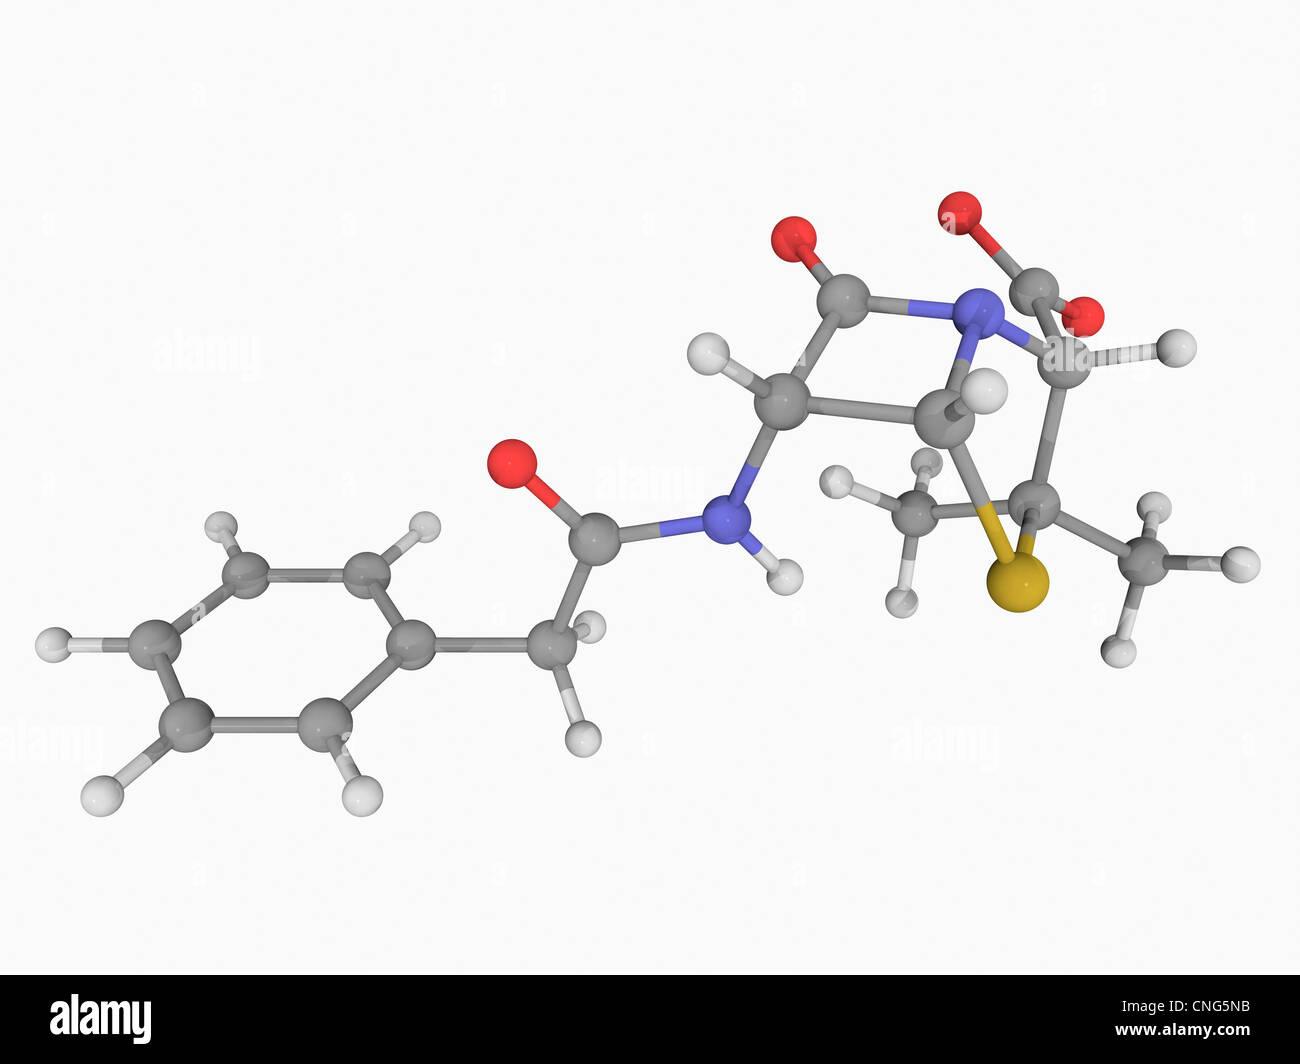 Penicillin G drug molecule - Stock Image